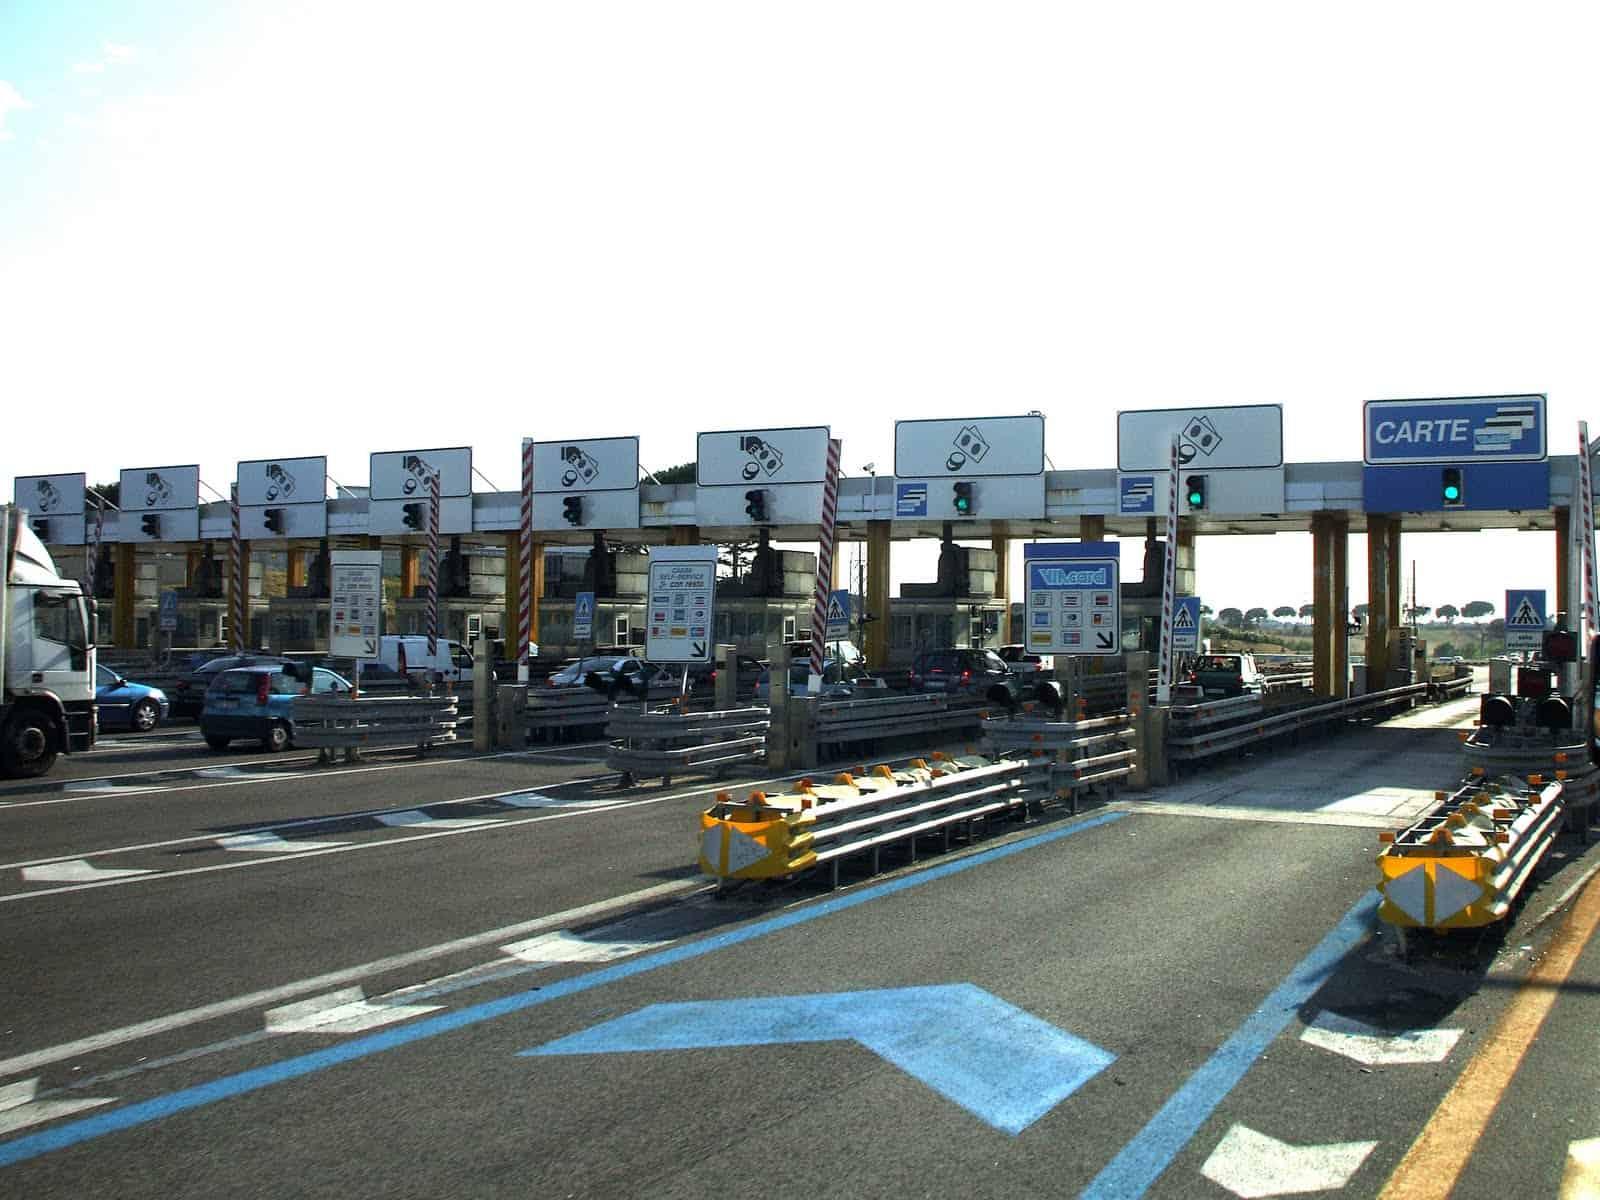 Autostradale torino milano pdf creator